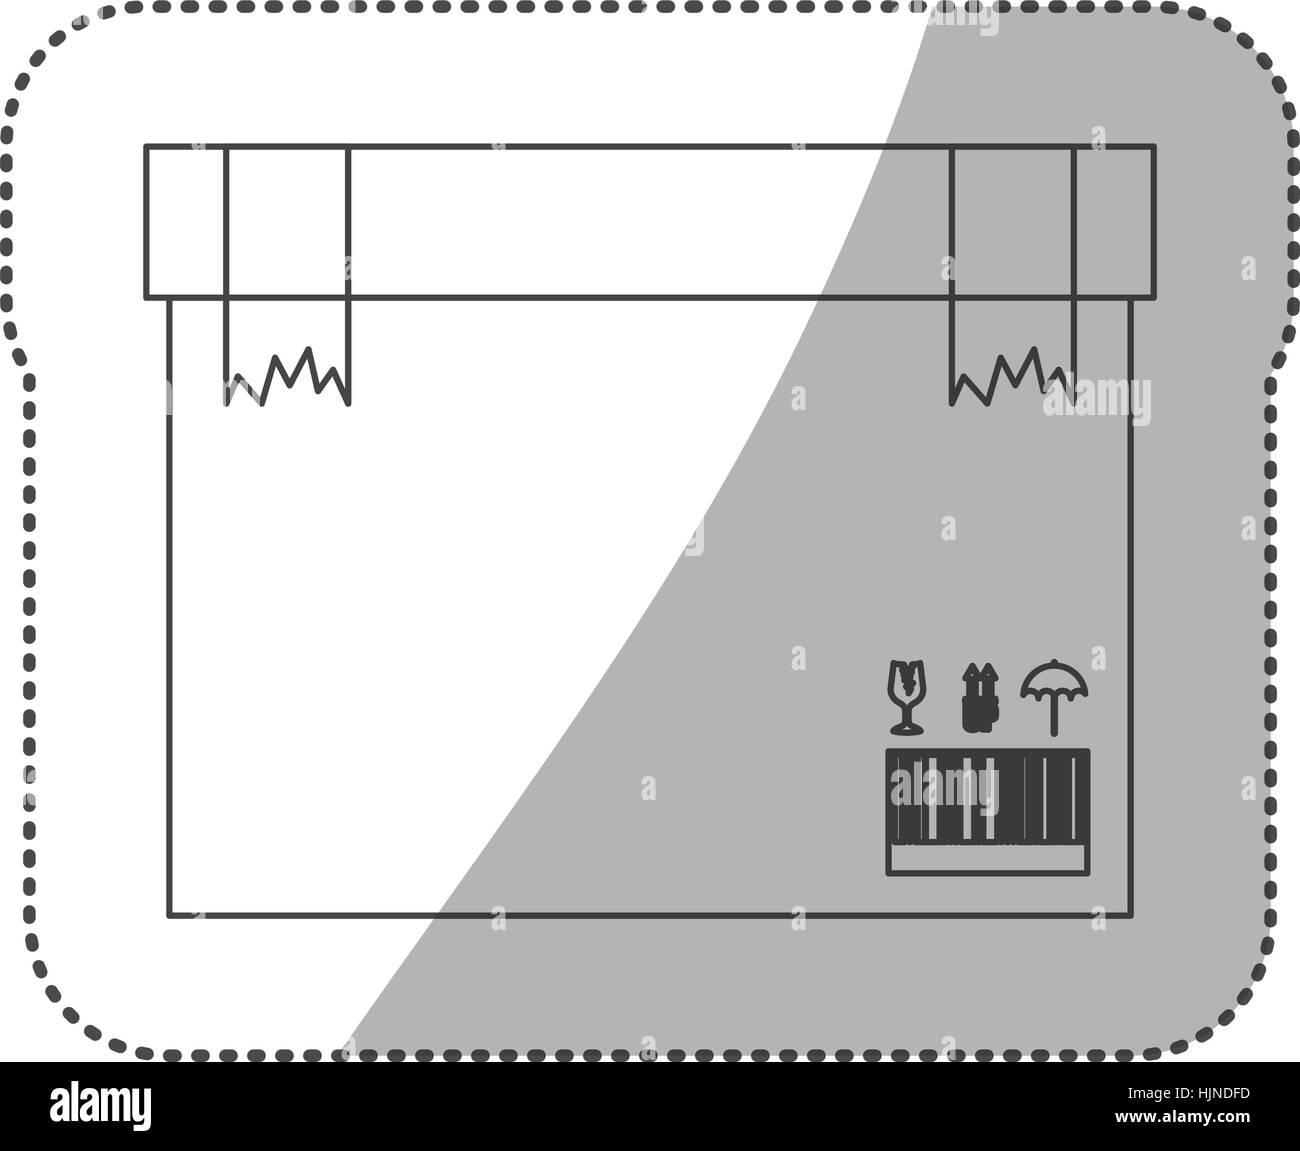 Delivery and logistic icon vector illustraton graphic design - Stock Vector